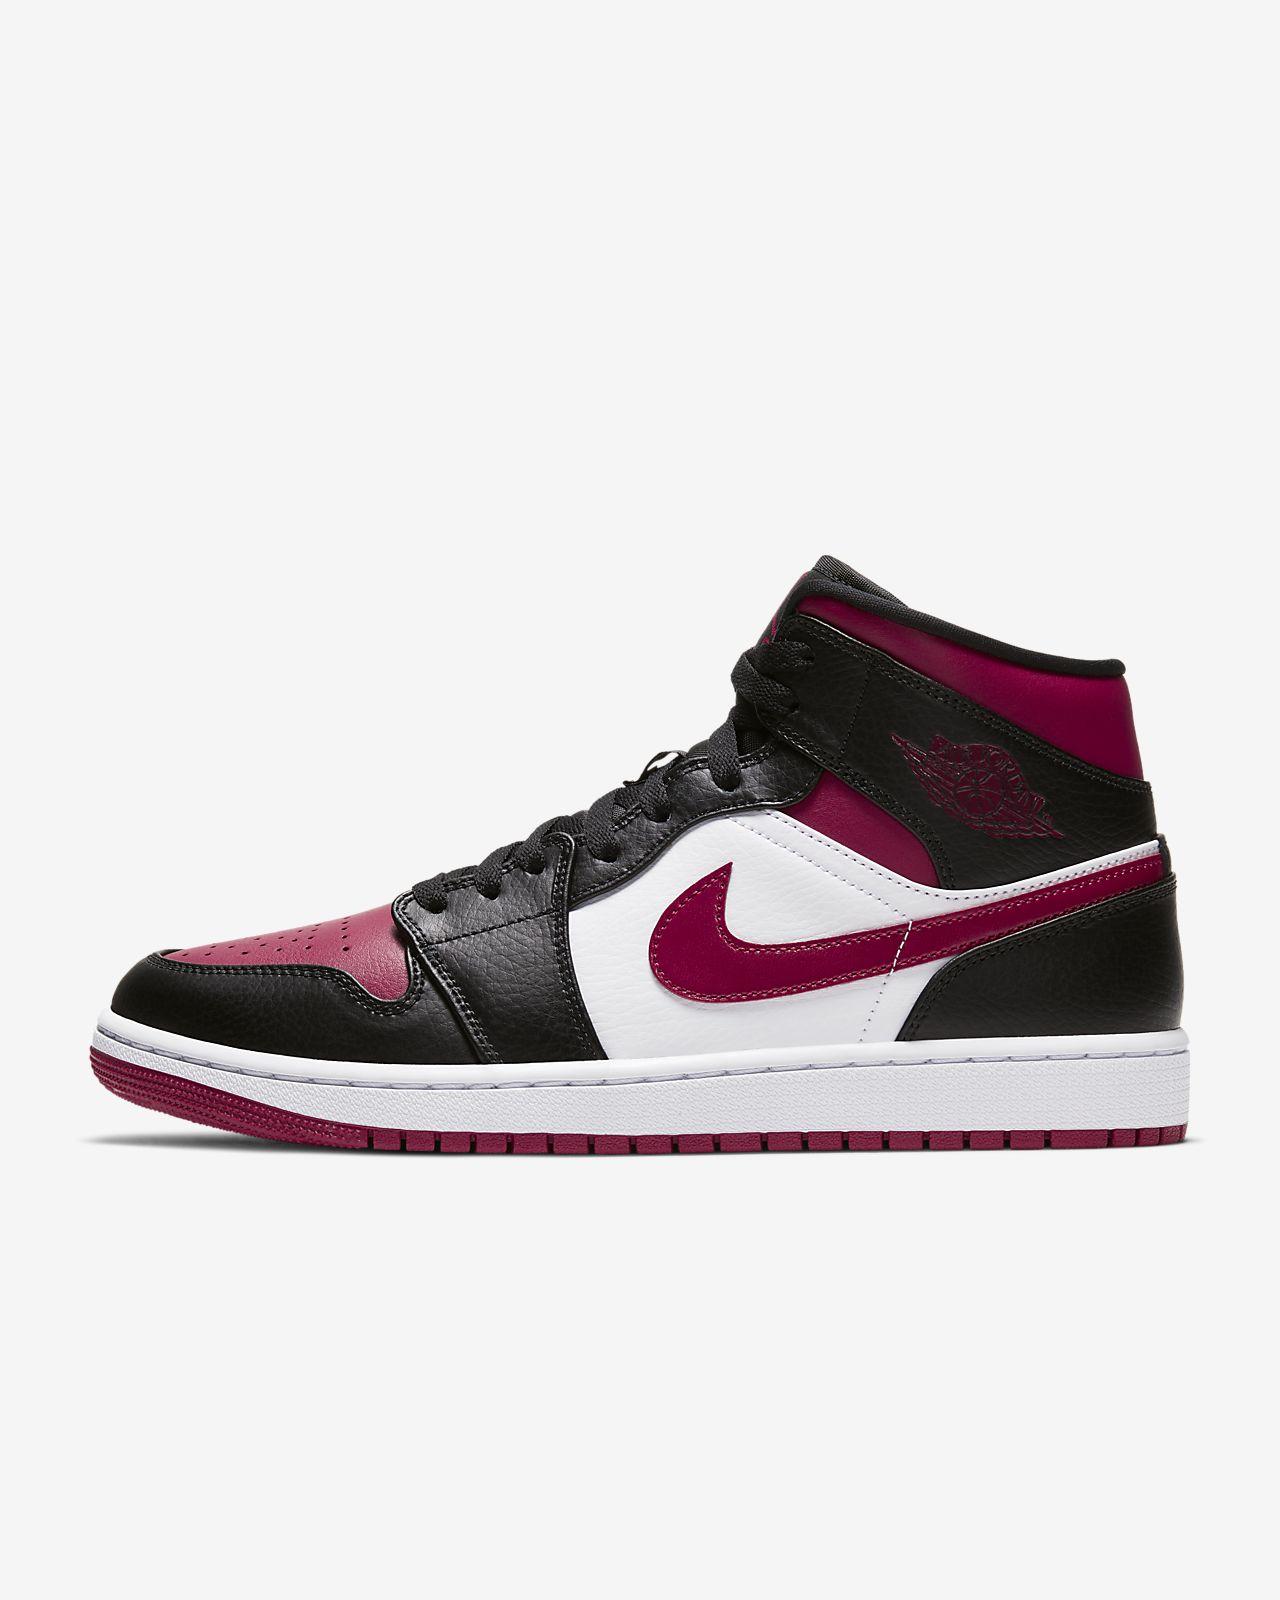 Jordan 1 Blanco Y Rojo Cheap Online